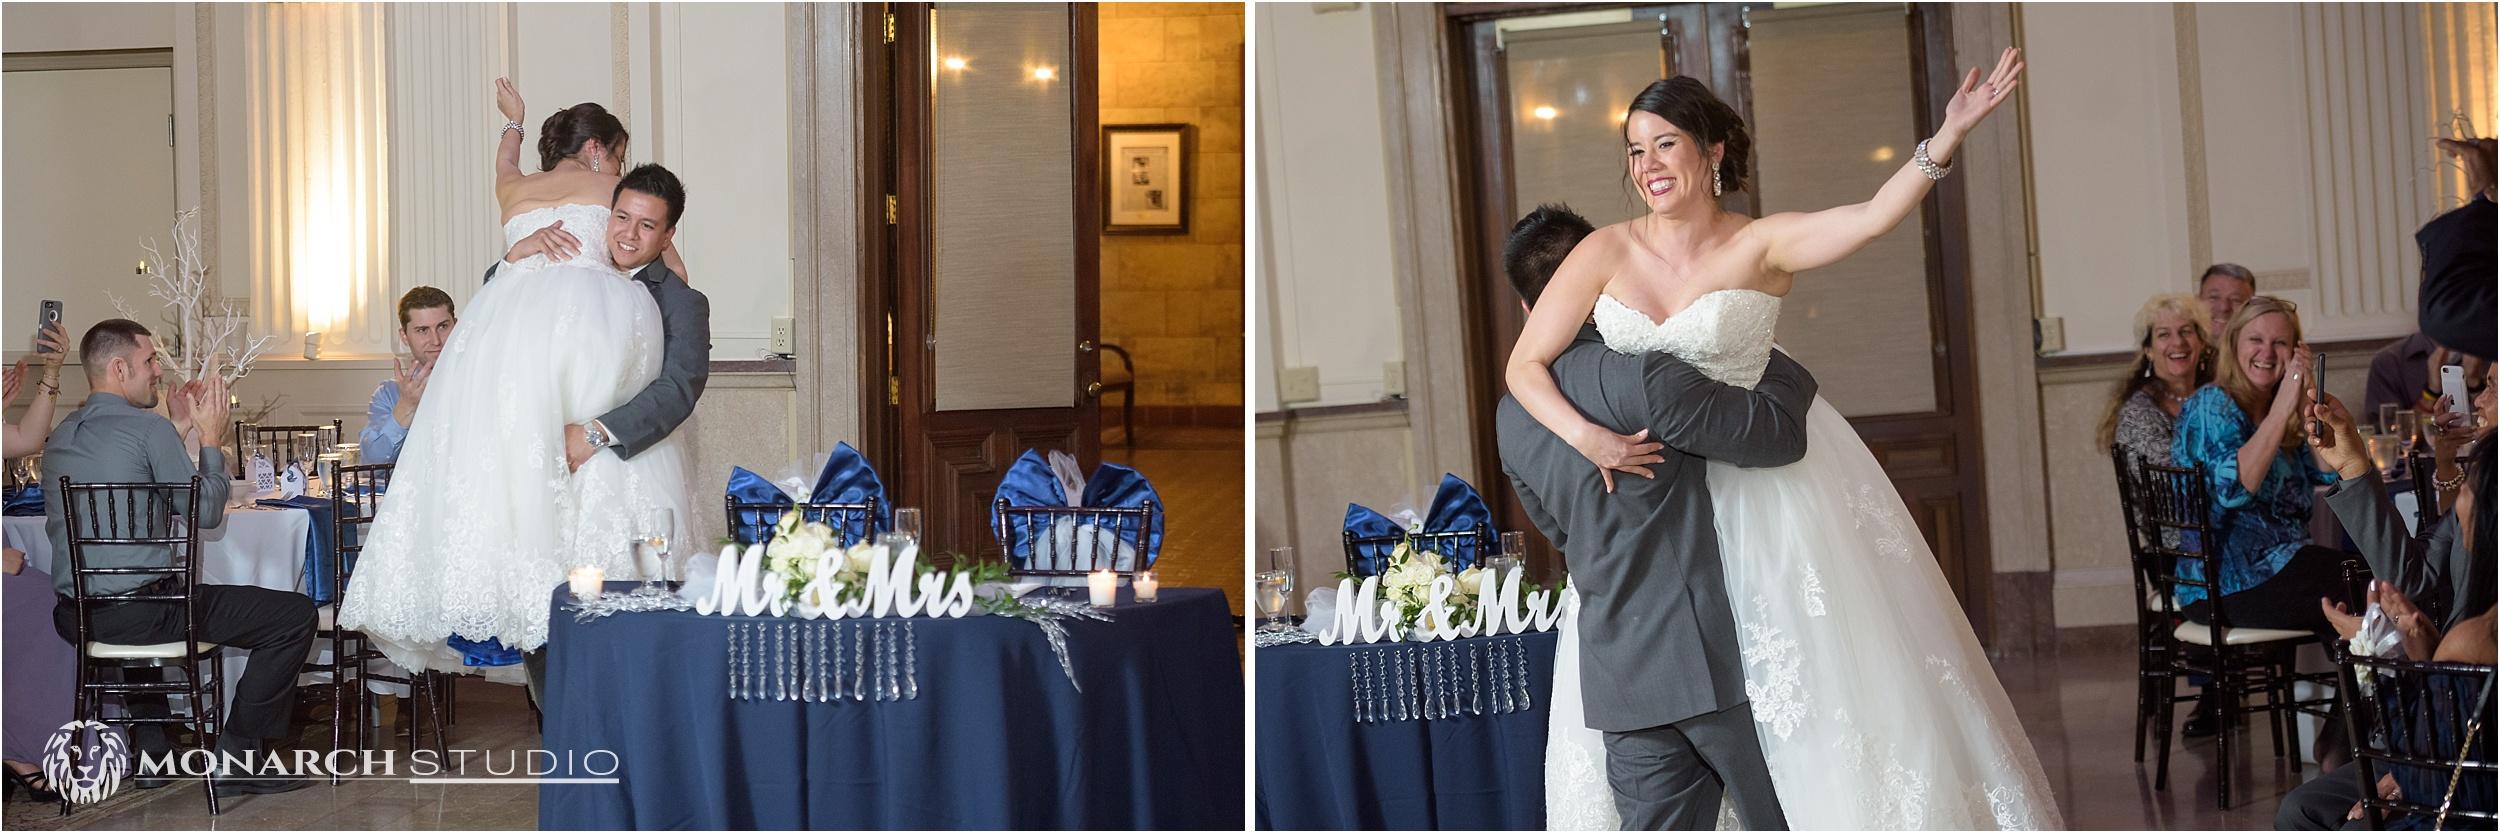 wedding-photographer-in-st-augustine-florida-treasury-081.jpg